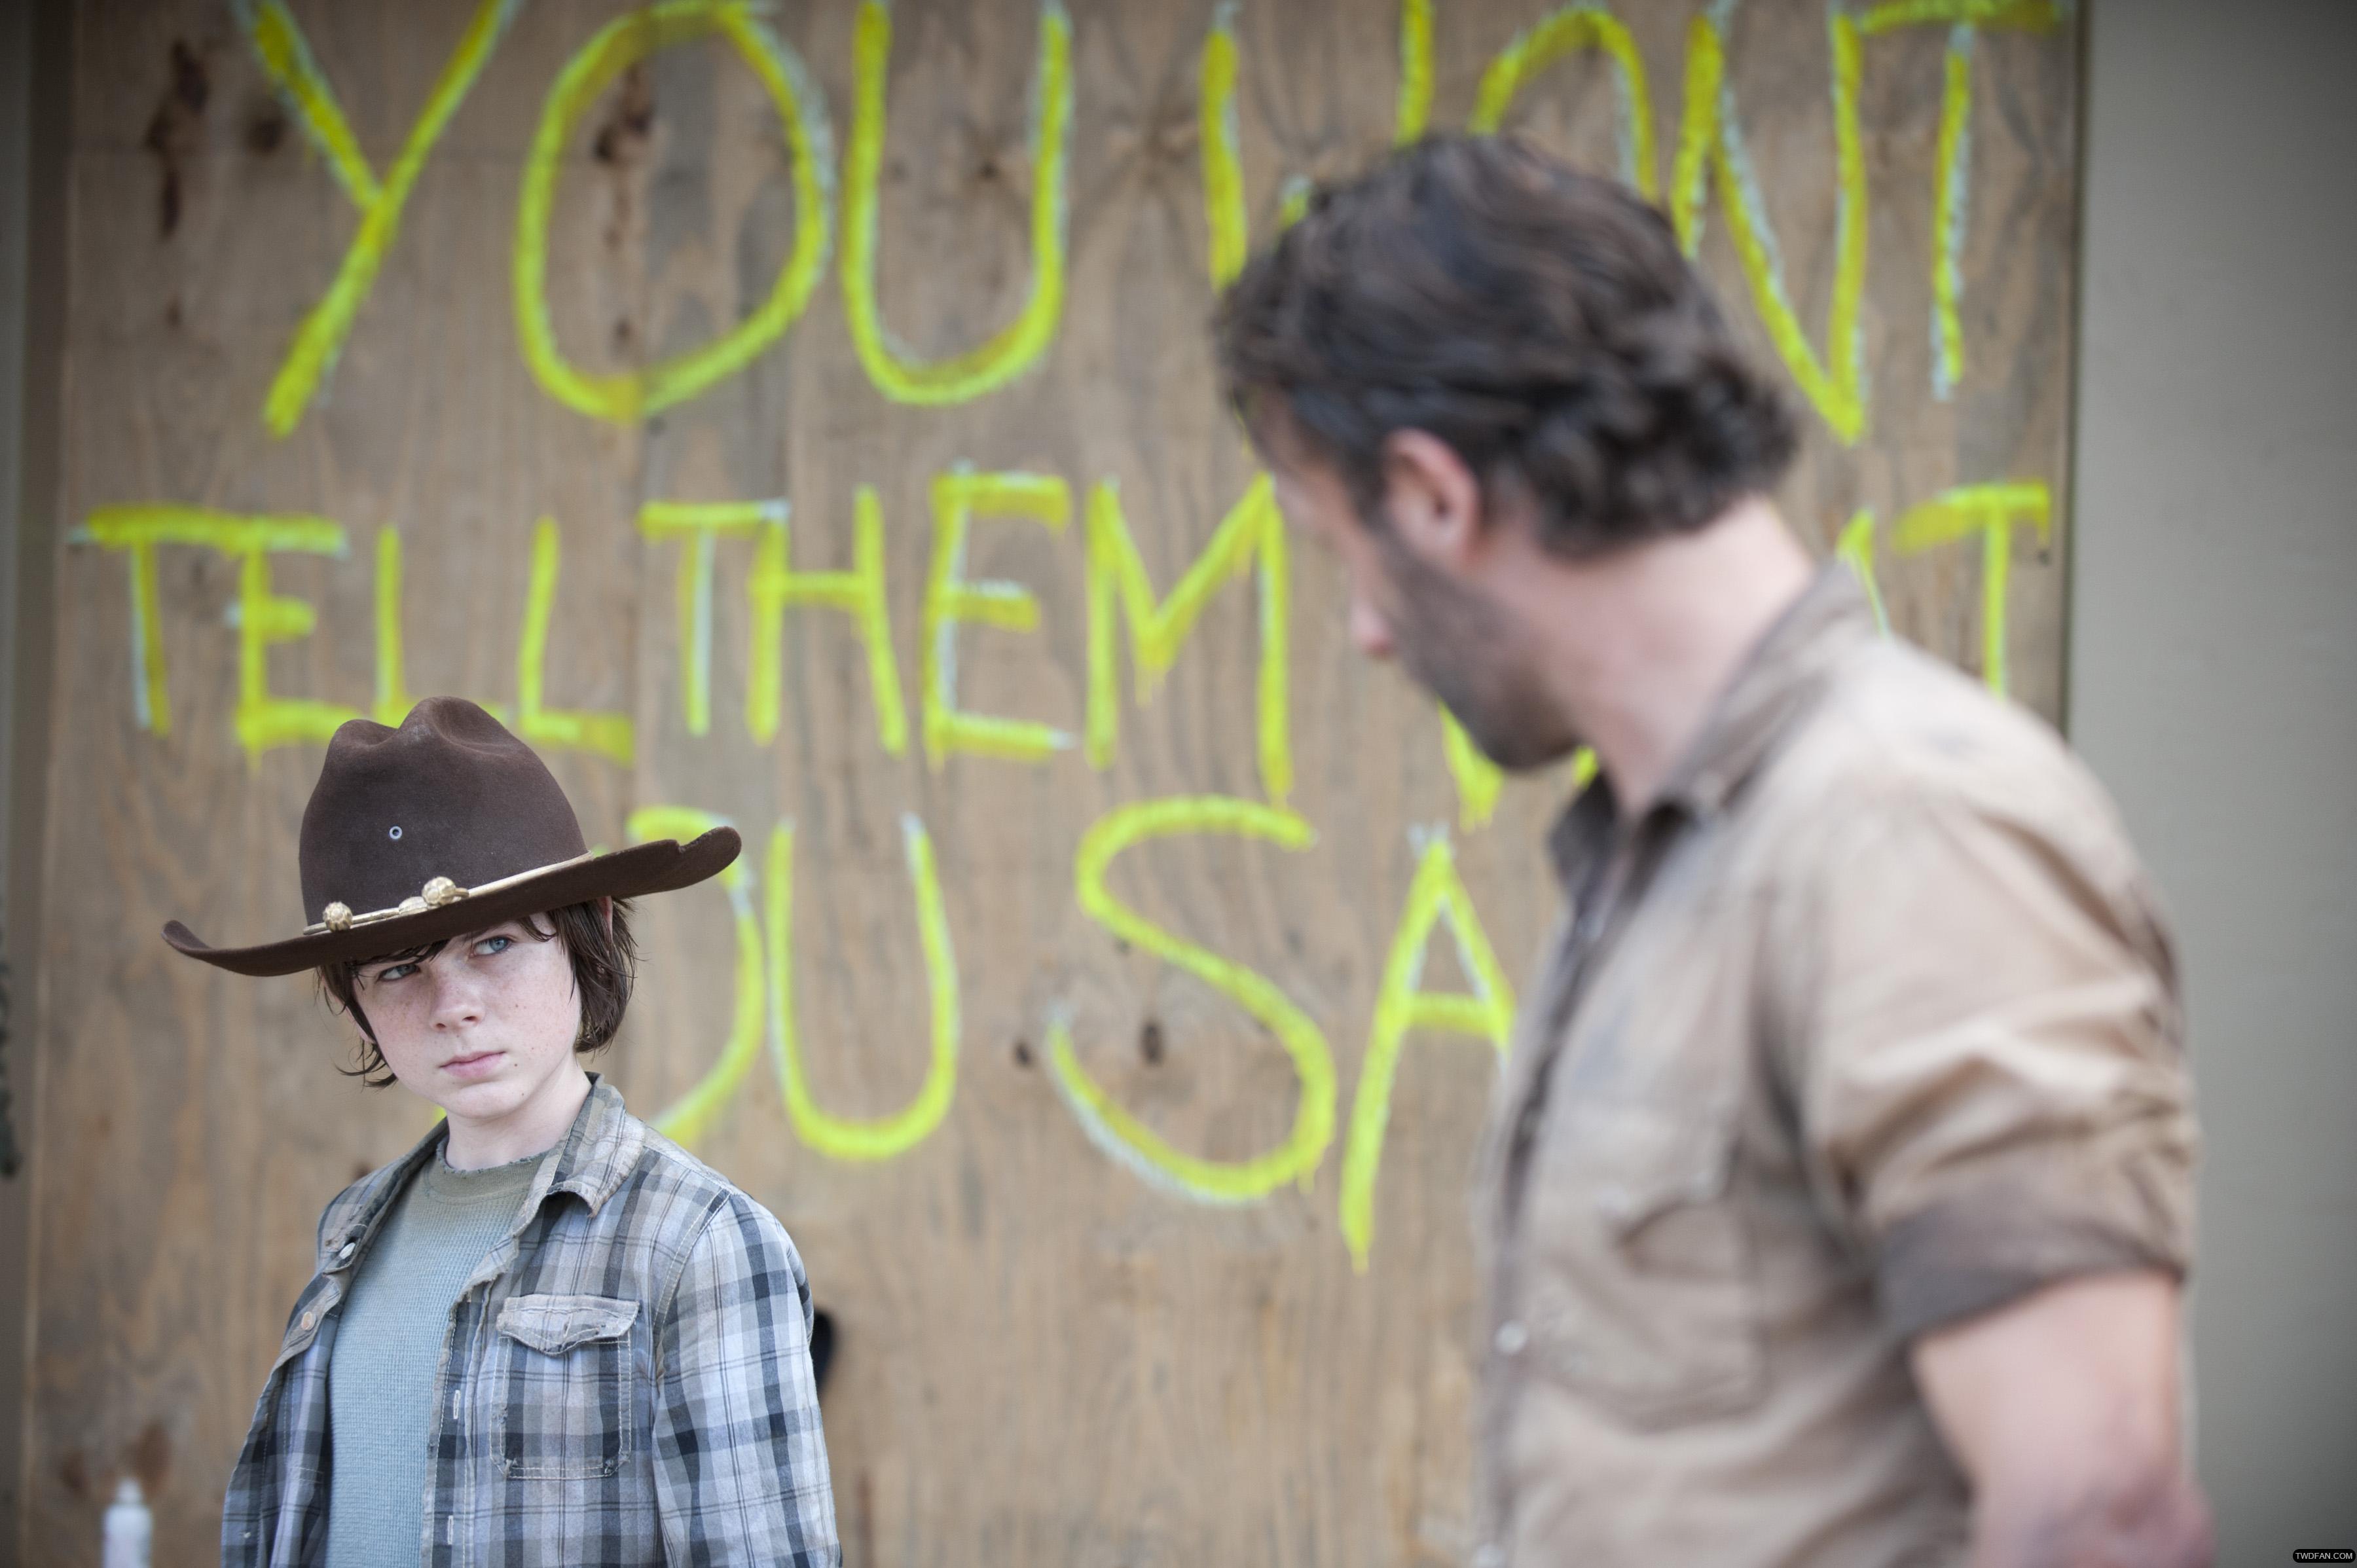 Robert Kirkman fala sobre o episódio de maior destaque da terceira temporada, até agora.